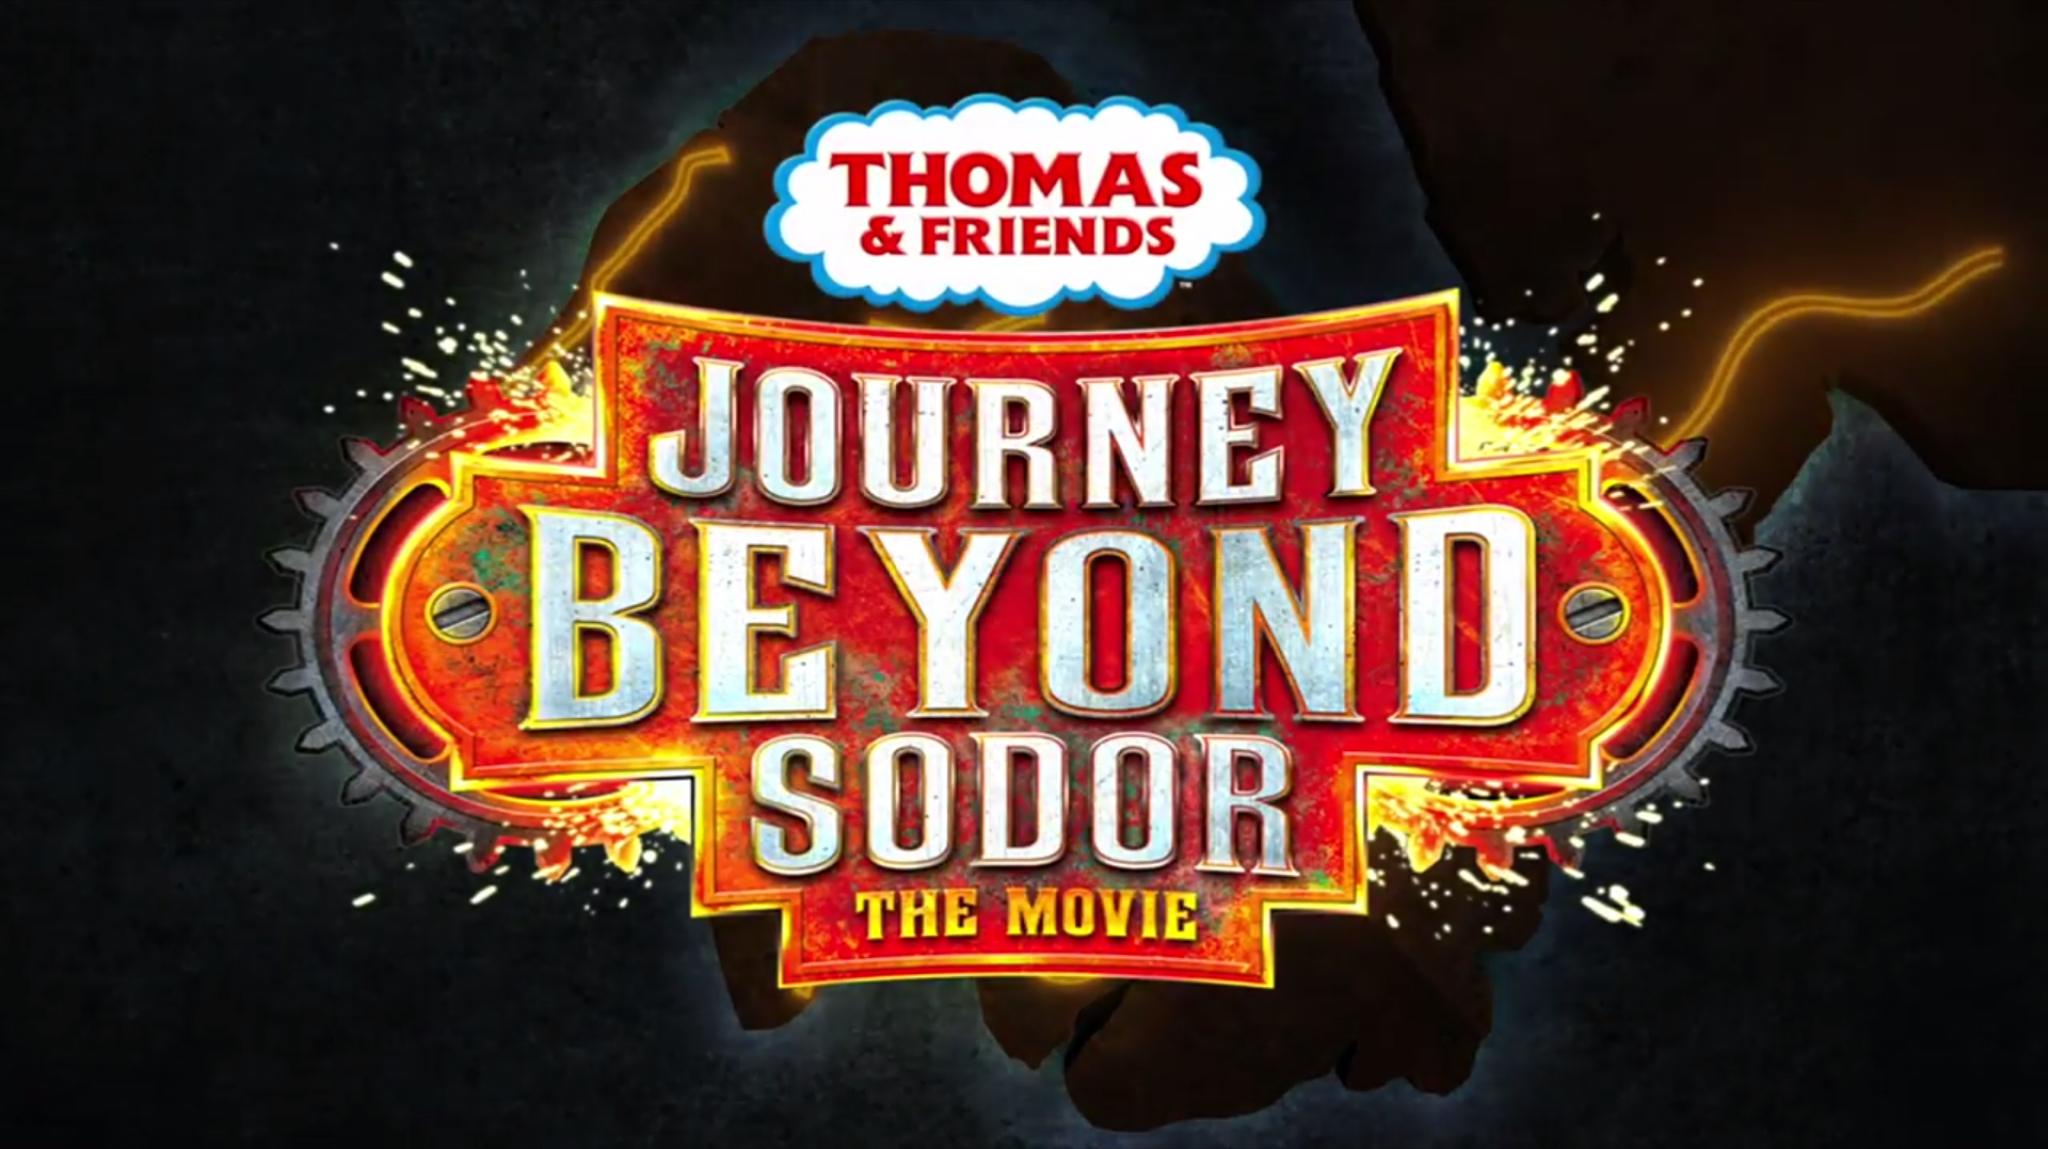 Journey Beyond Sodor/Transcript